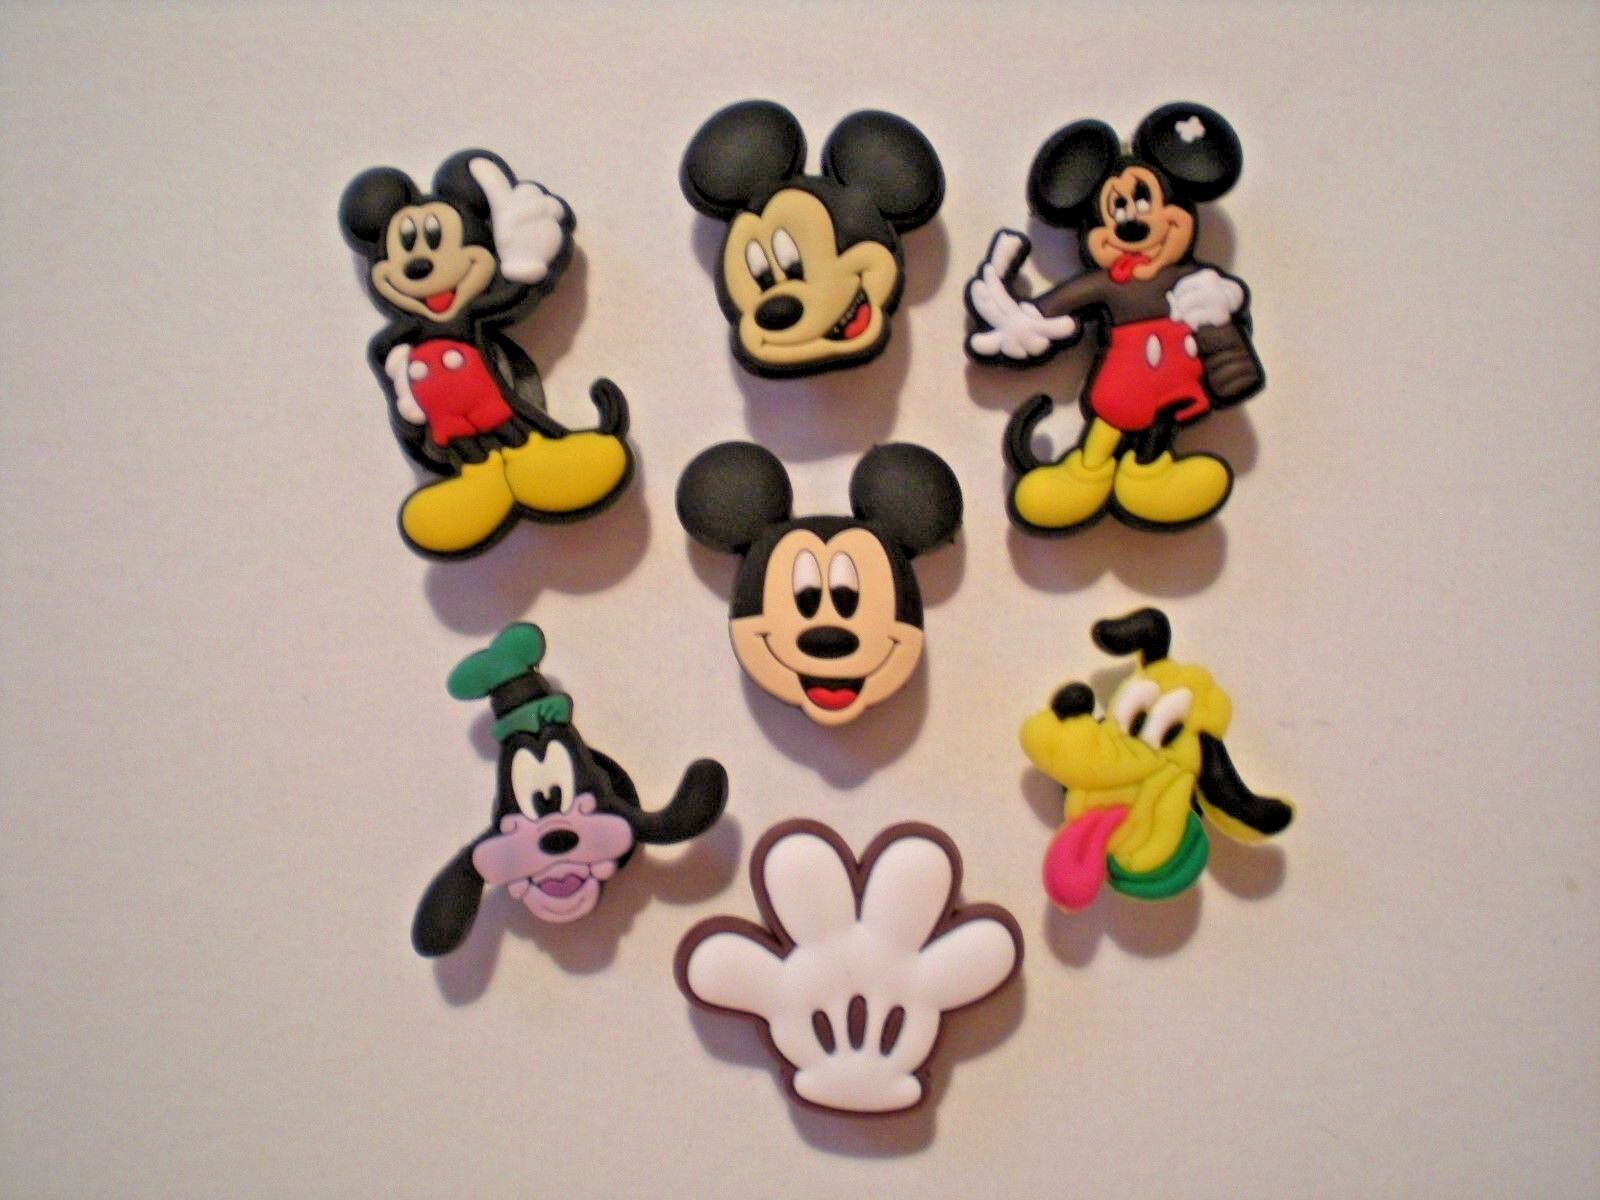 Clog Shoe Plug Button Charms Fit Bracelet Accessories Mickey Mouse